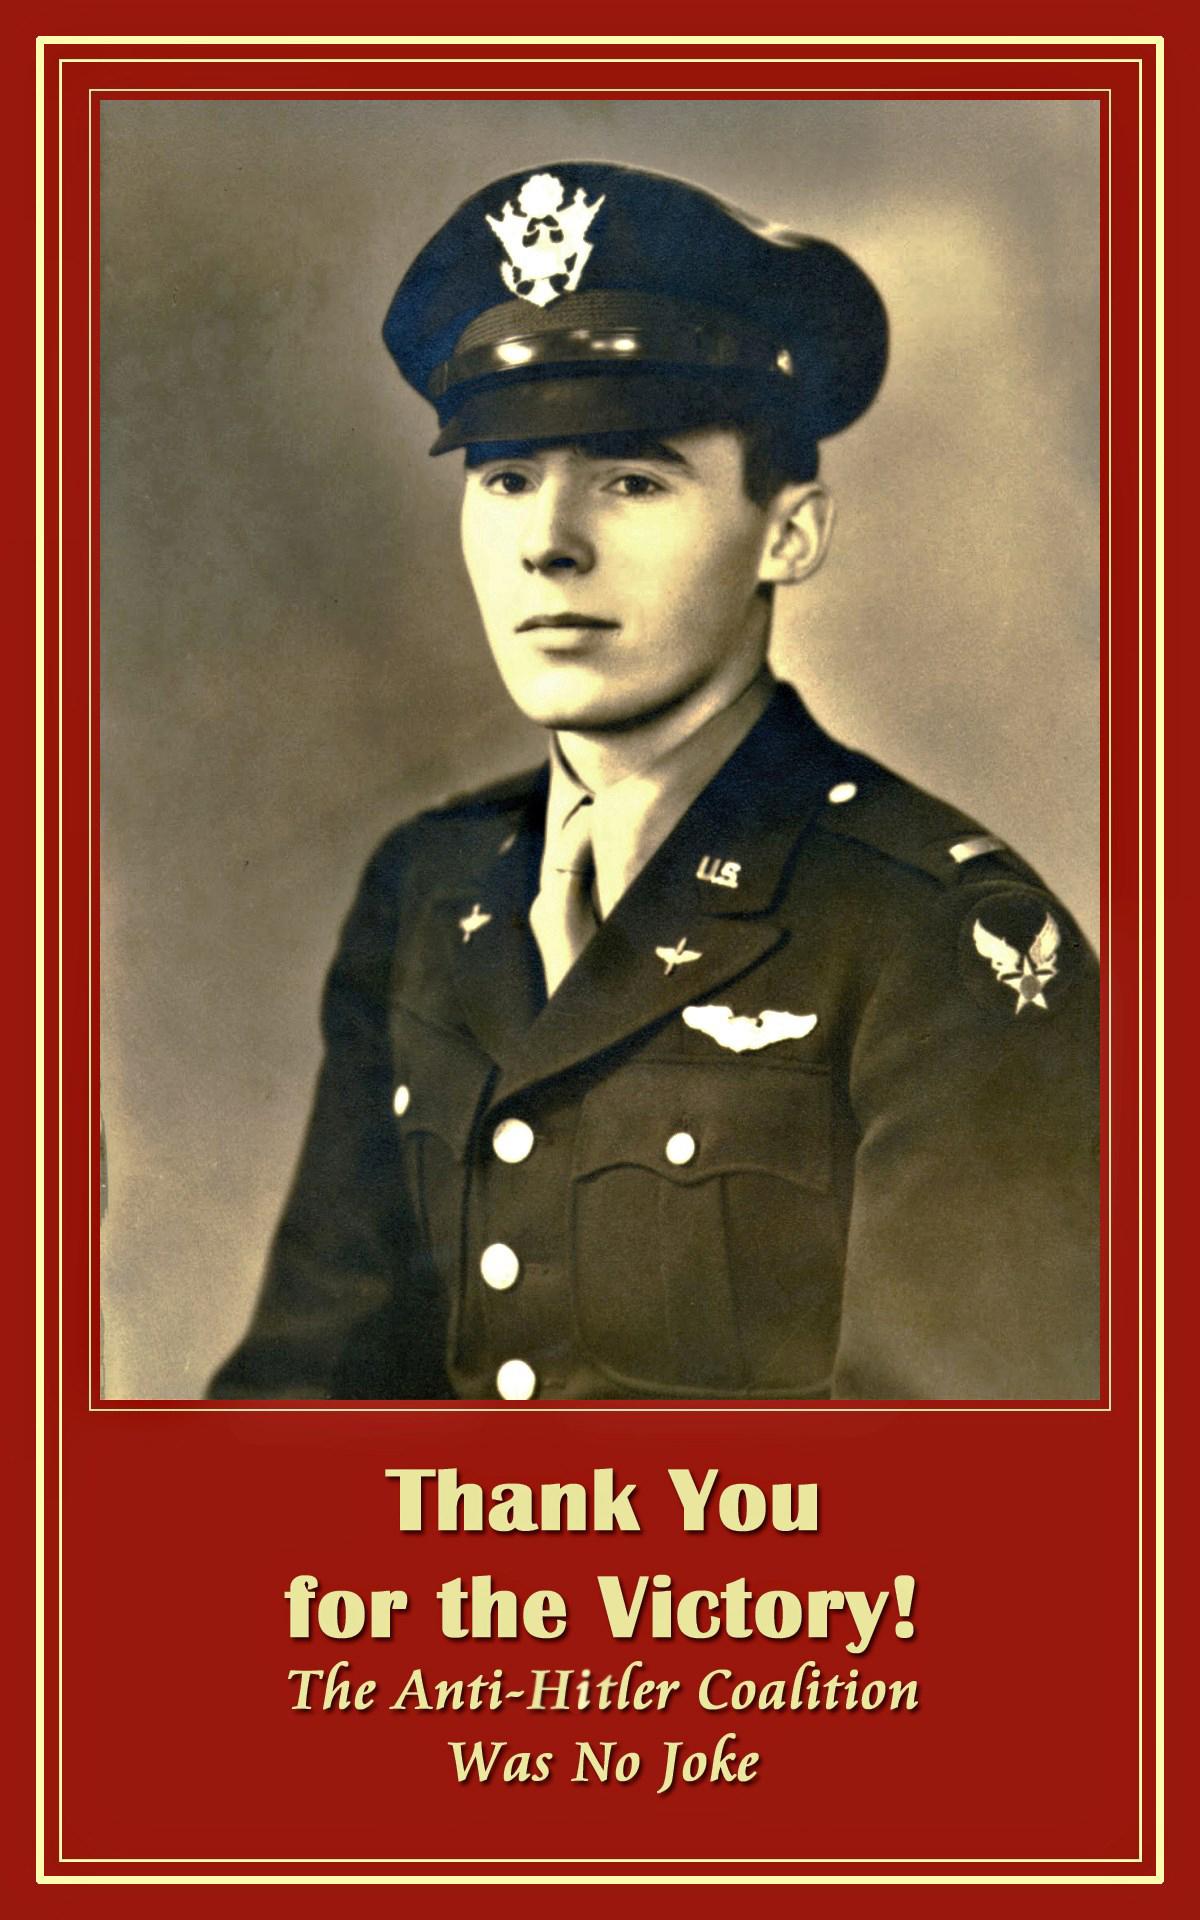 00 USA veteran WW2. 24.03.15